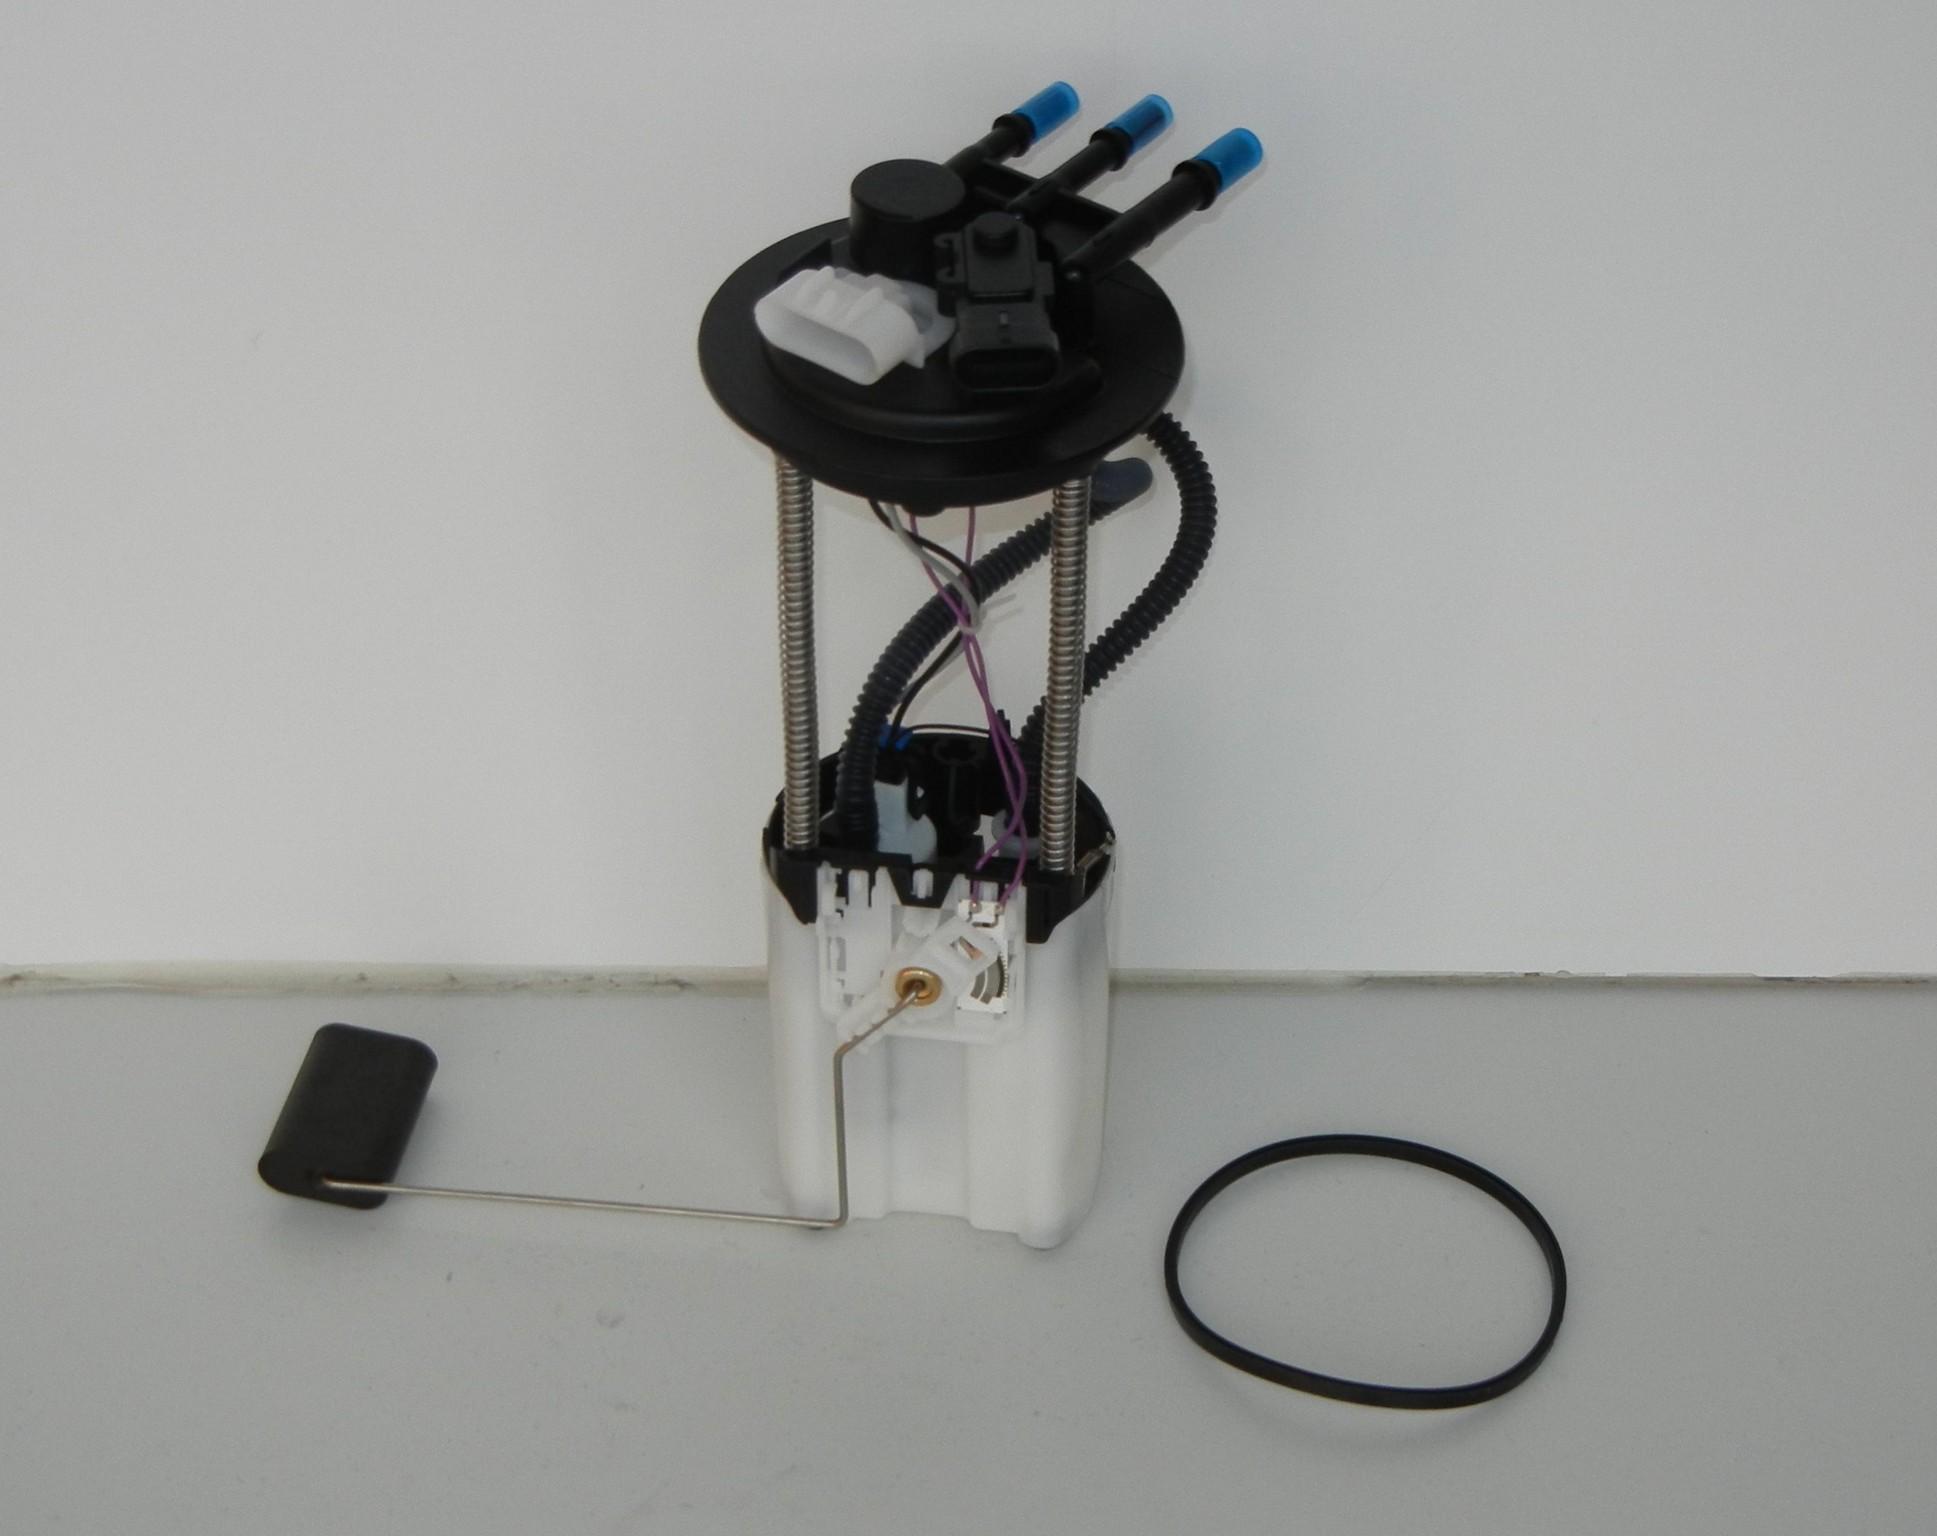 ... 2005 GMC Canyon Fuel Pump Module Assembly A0 F2625A ...